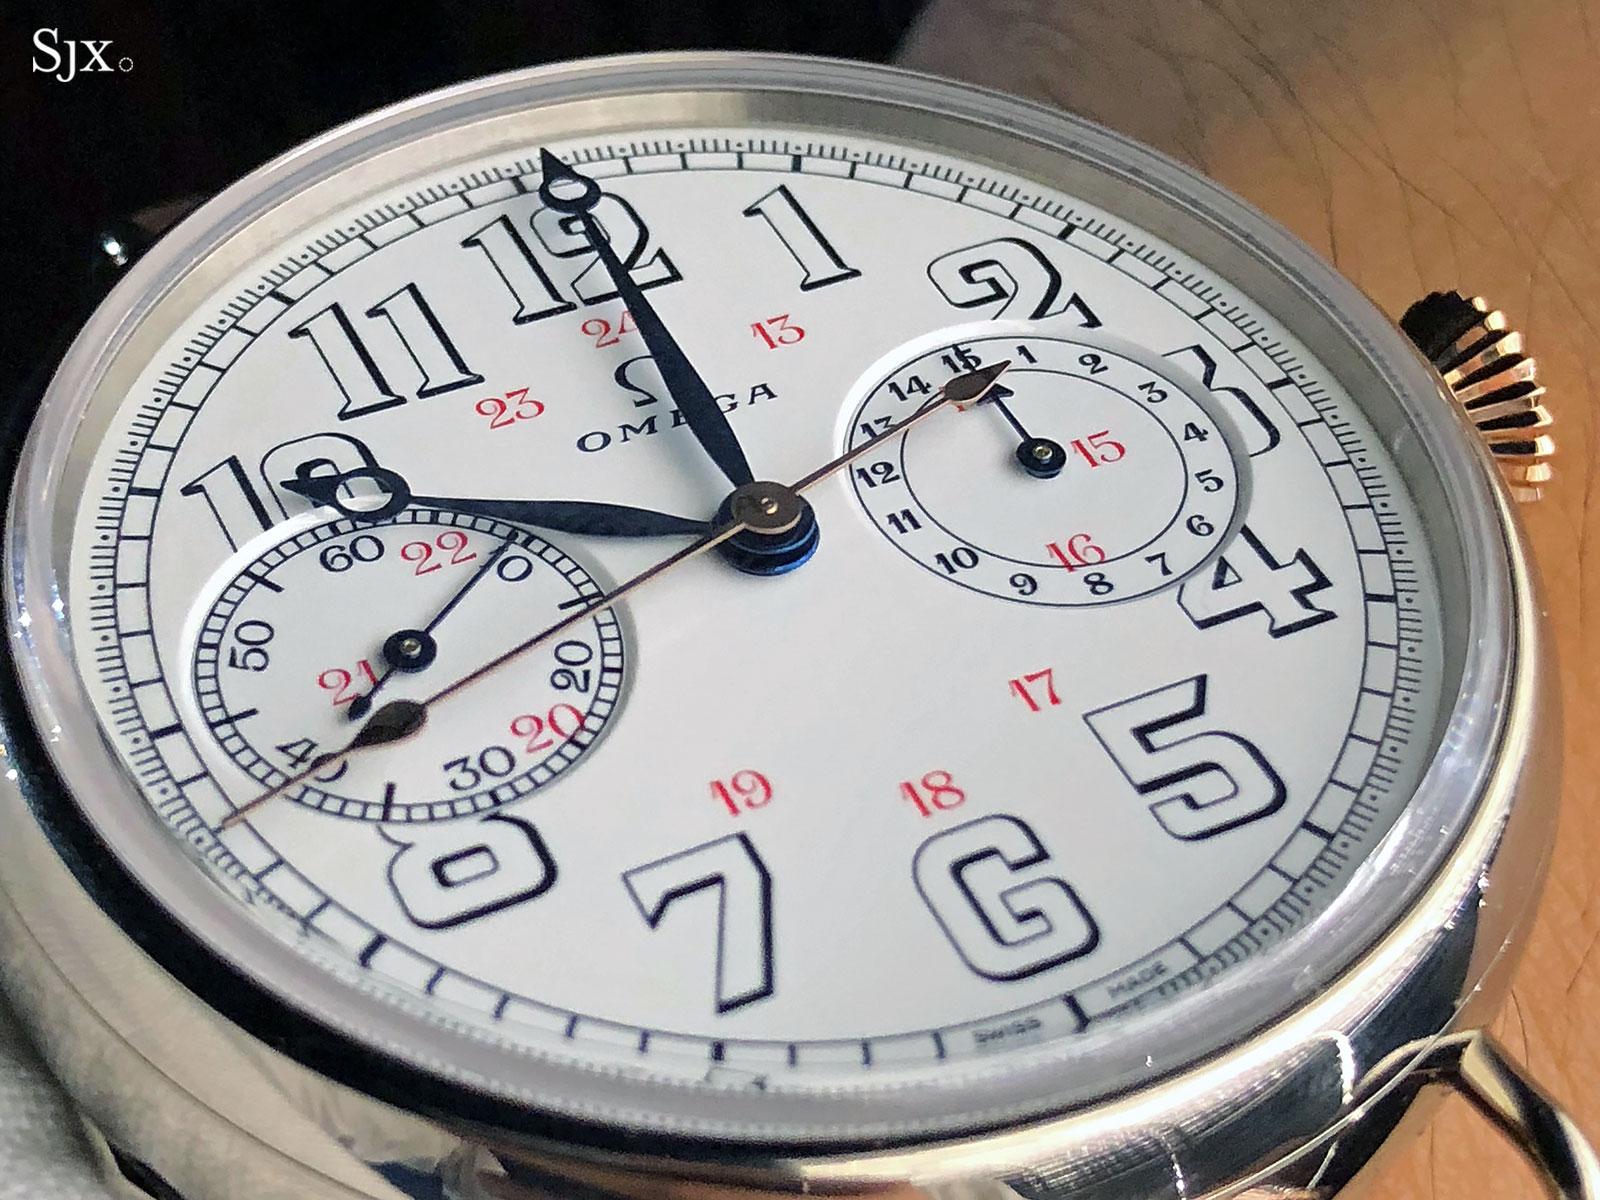 First OMEGA Wrist-Chronograph Limited Edition 18'''CHRO 12